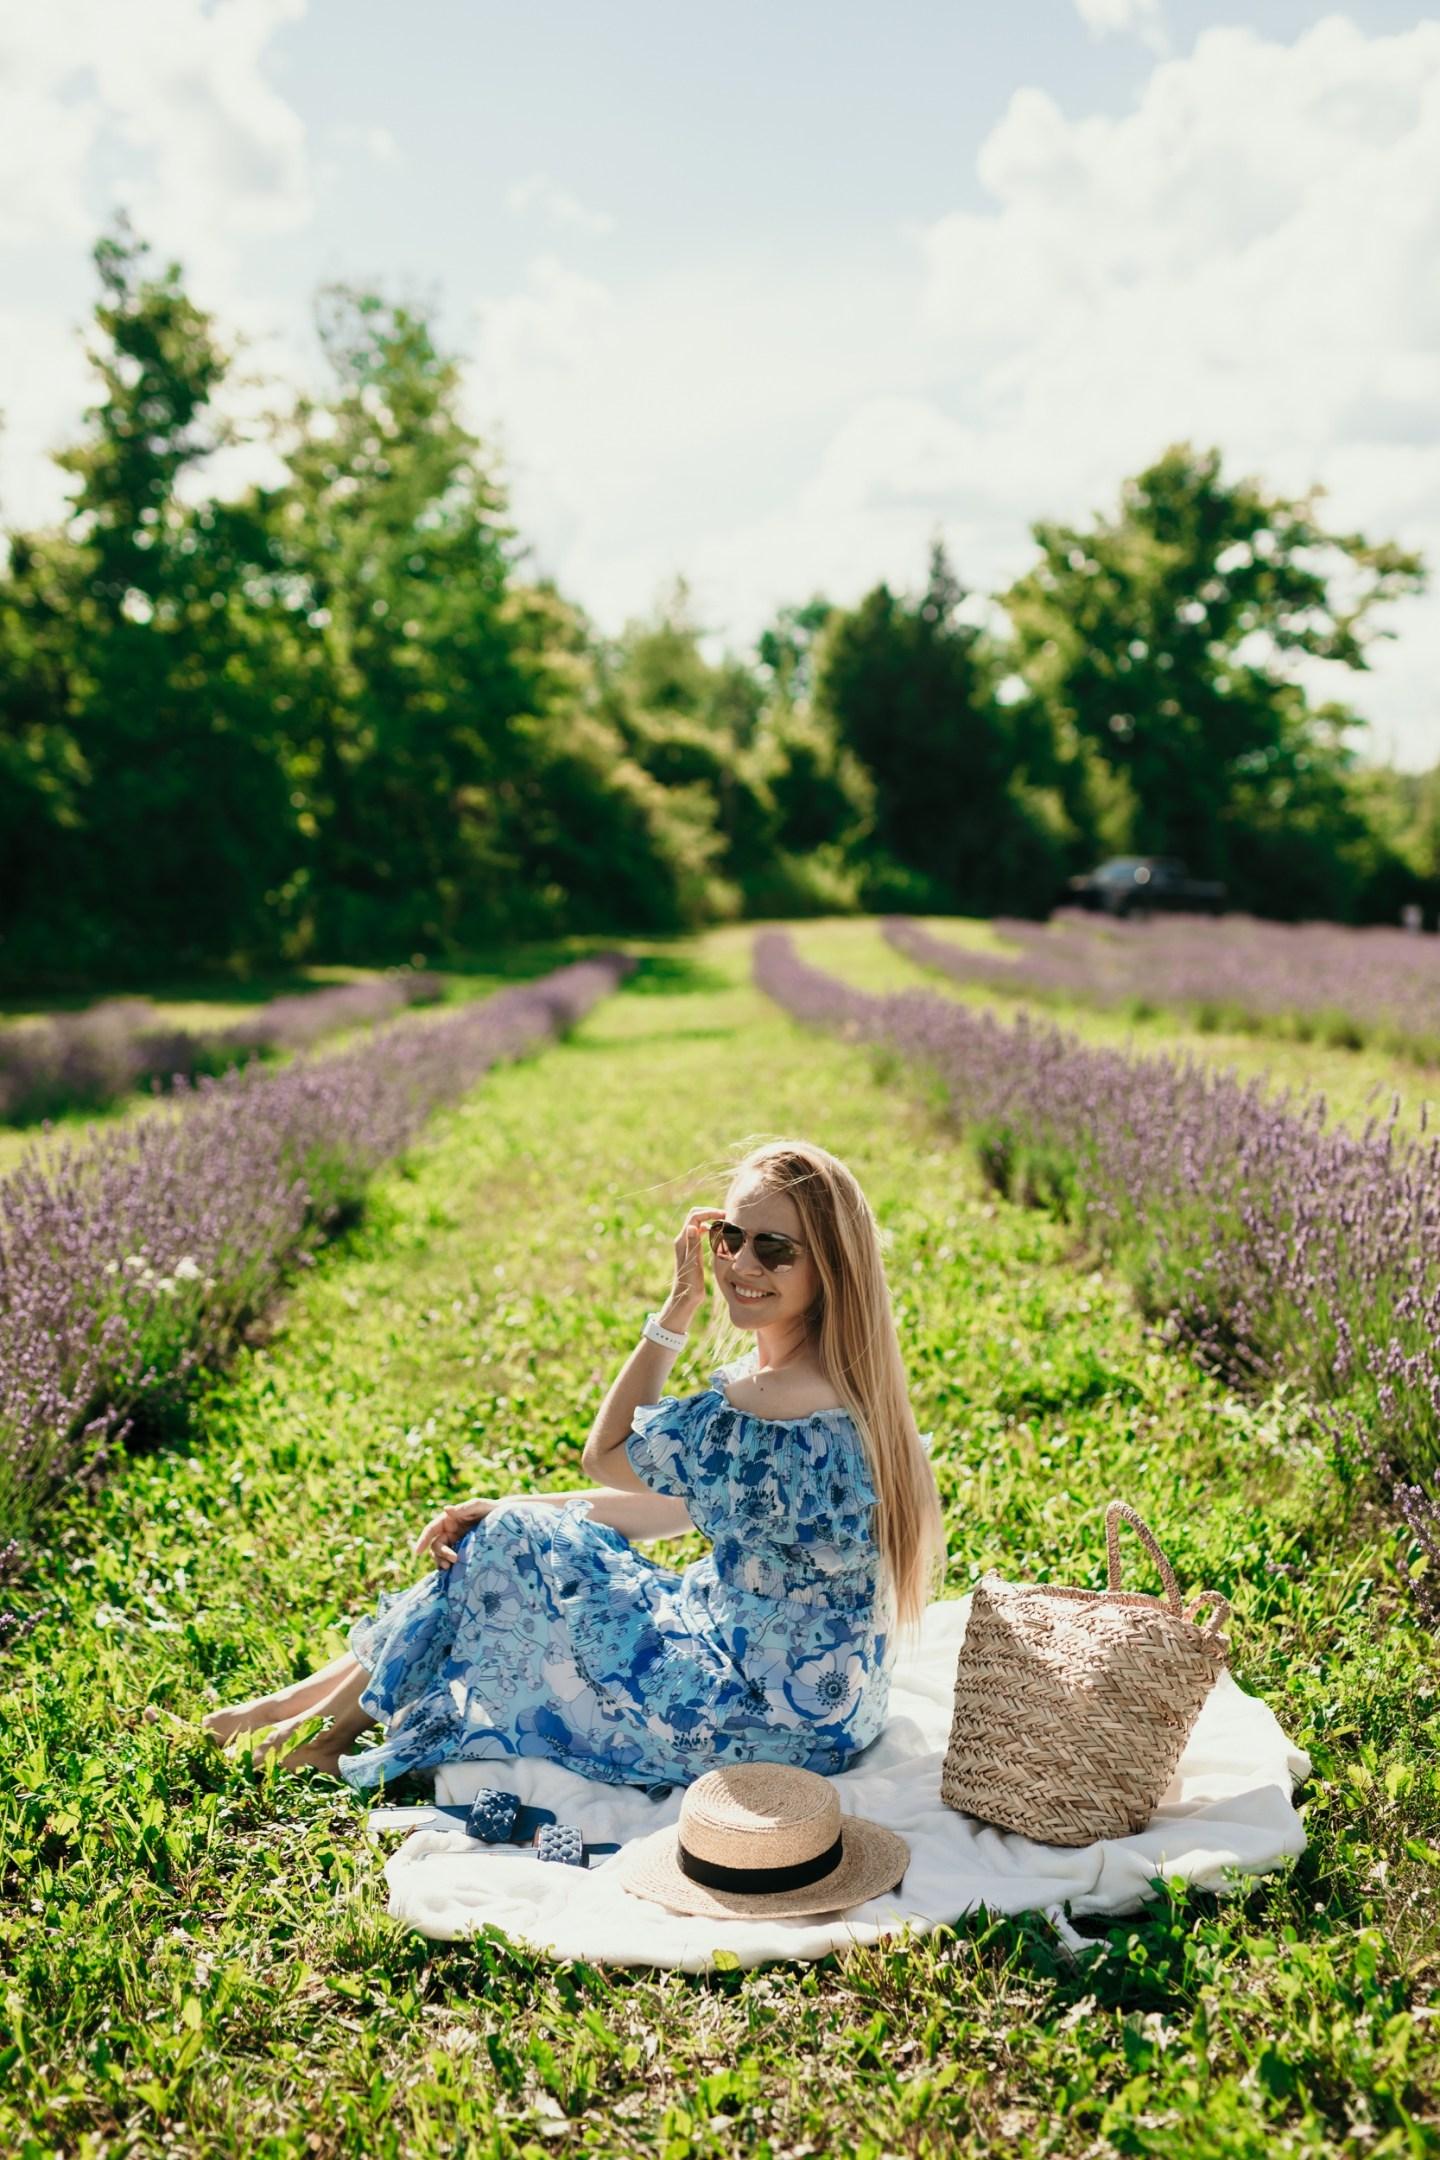 An Afternoon Trip To Terre Bleu Lavender Farm